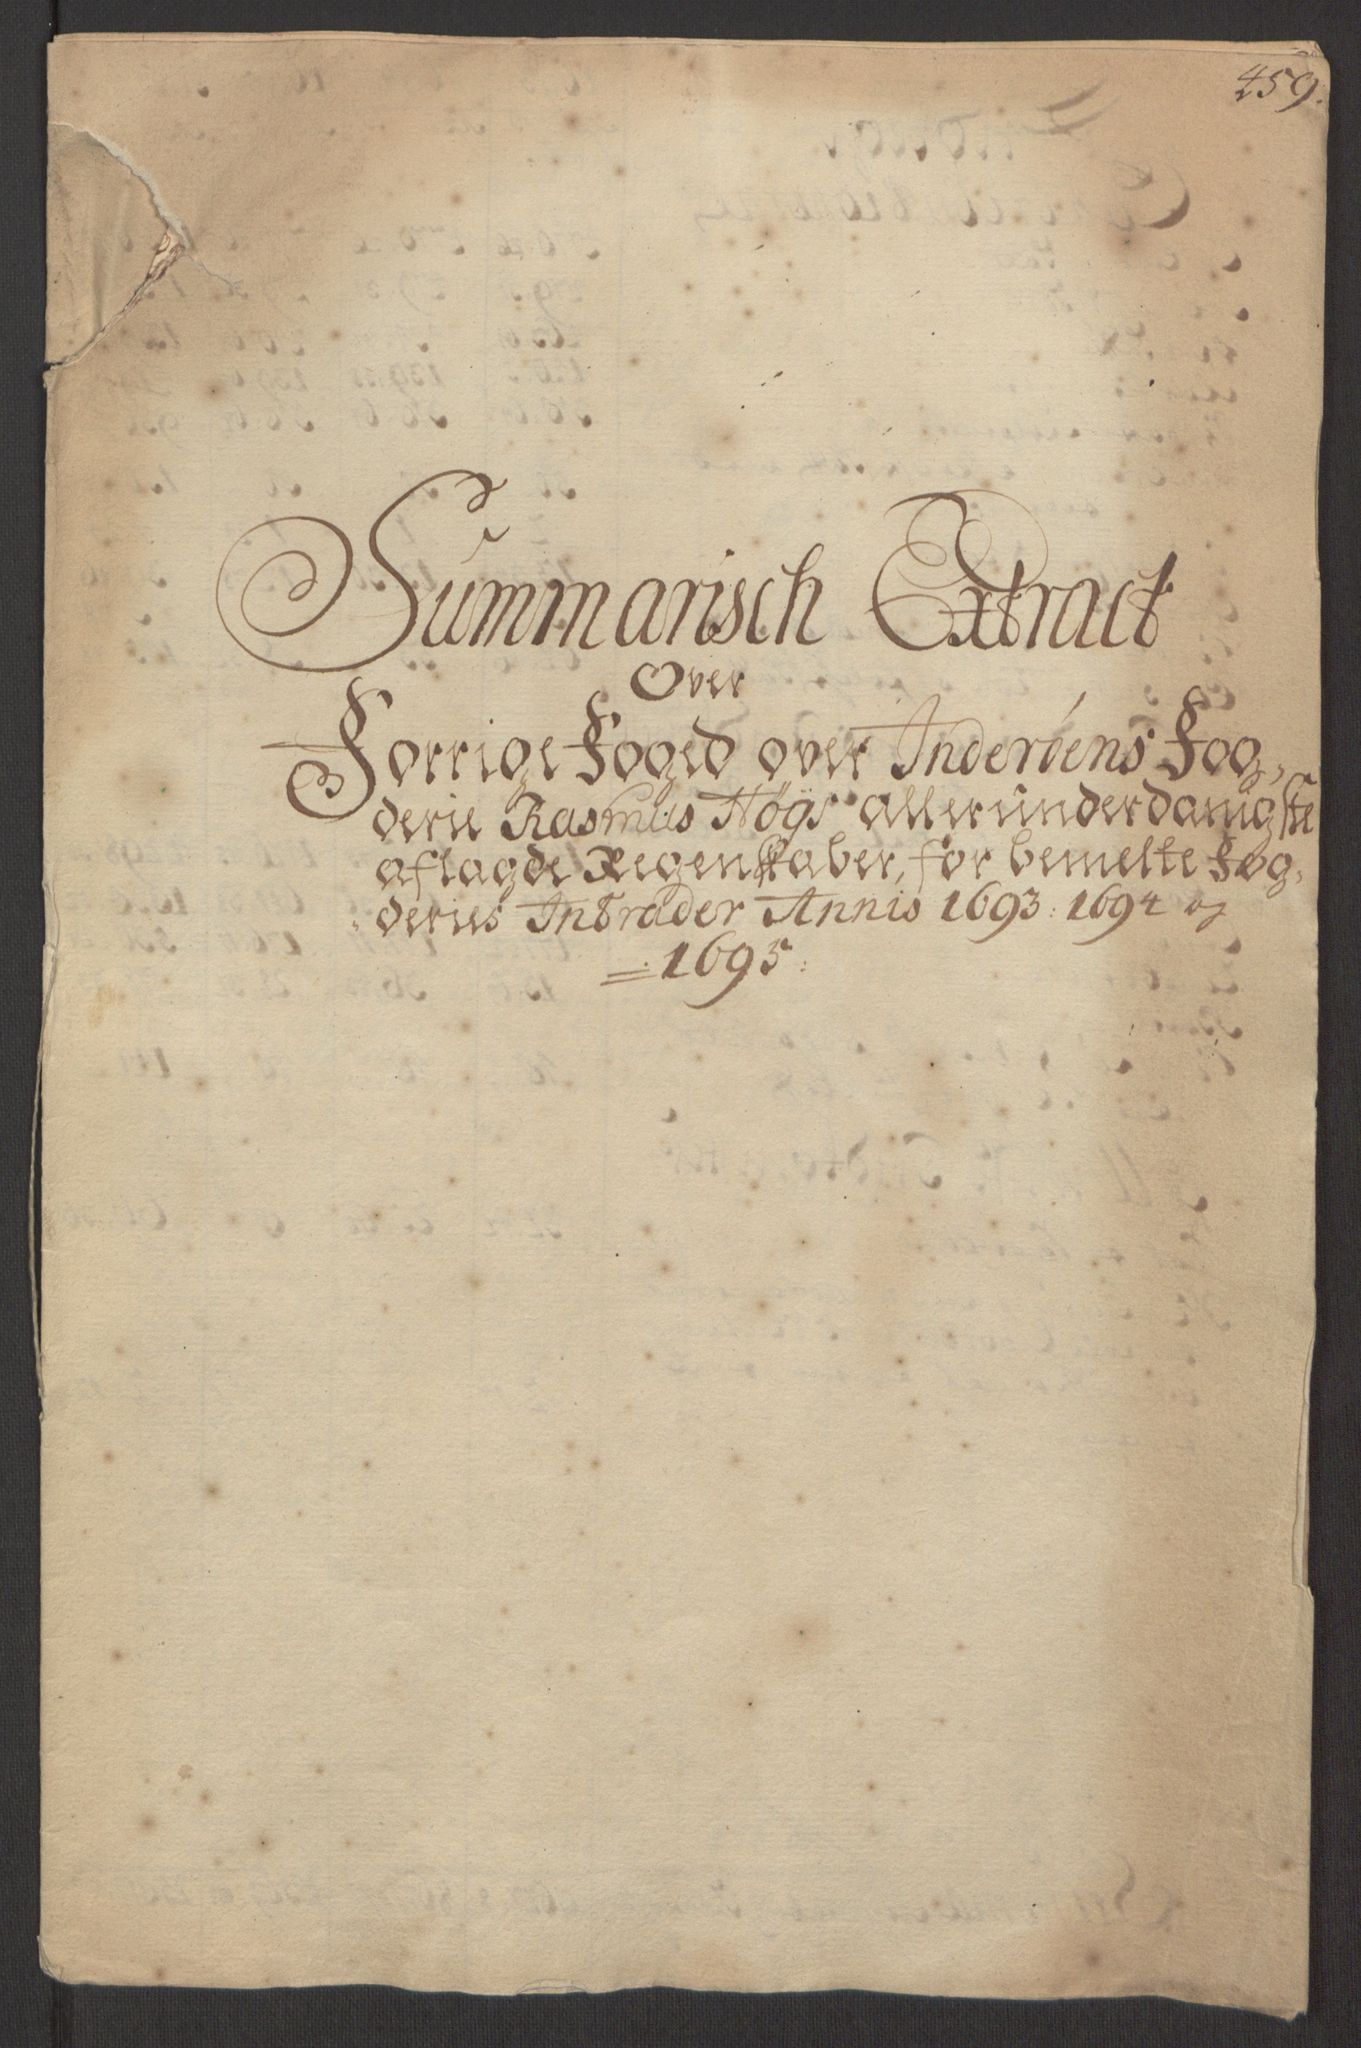 RA, Rentekammeret inntil 1814, Reviderte regnskaper, Fogderegnskap, R63/L4309: Fogderegnskap Inderøy, 1695-1697, s. 12